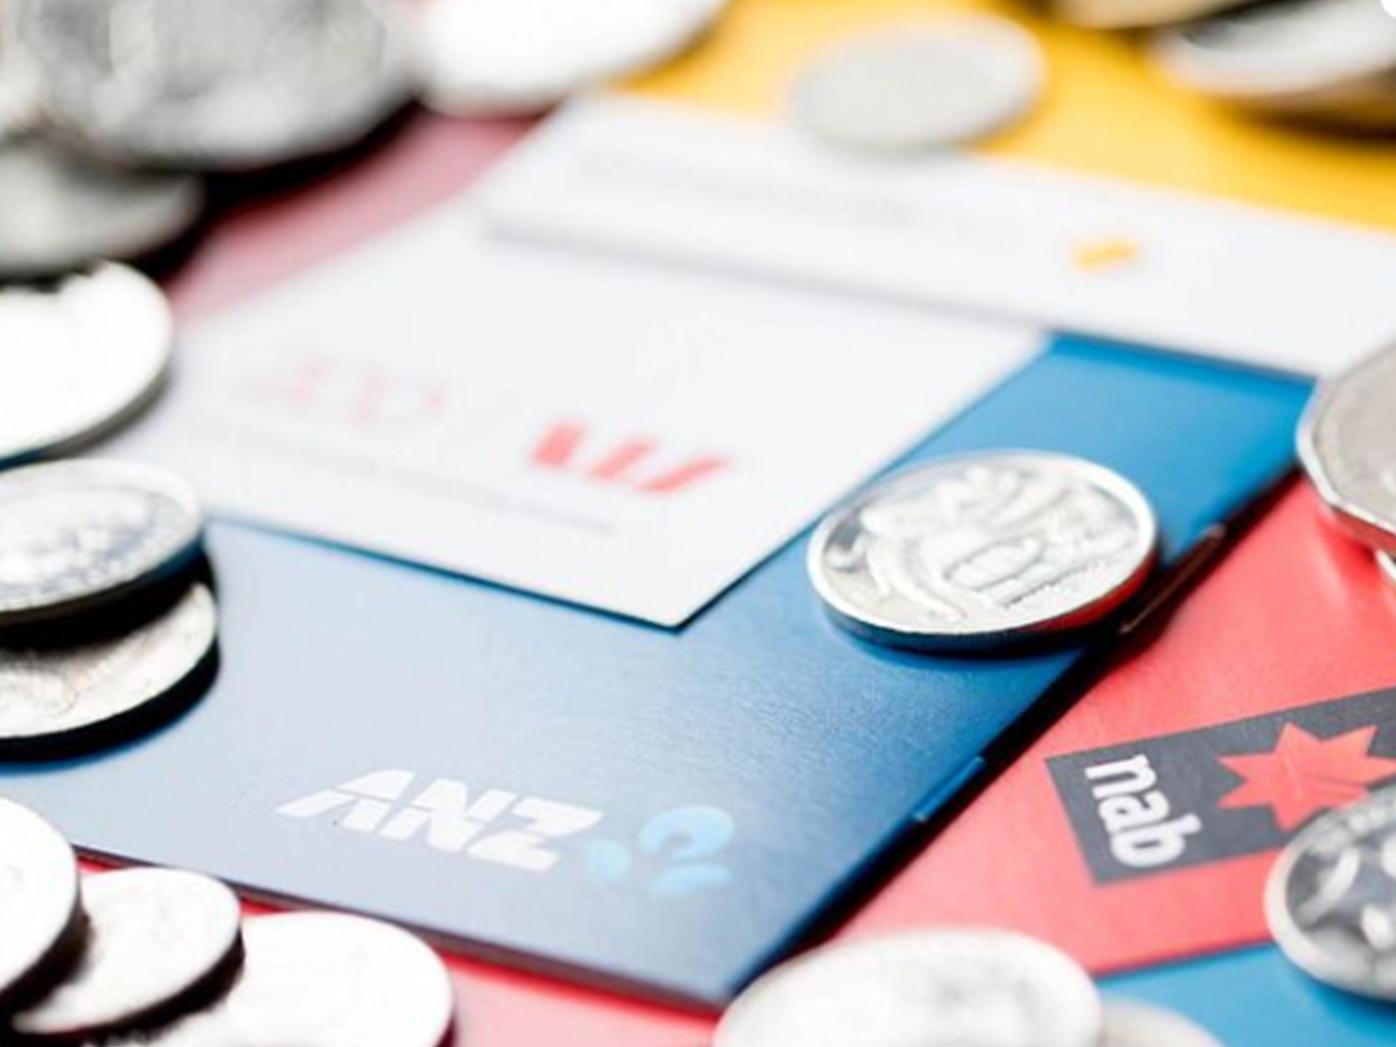 Australians urged to set up 'crisis' budget